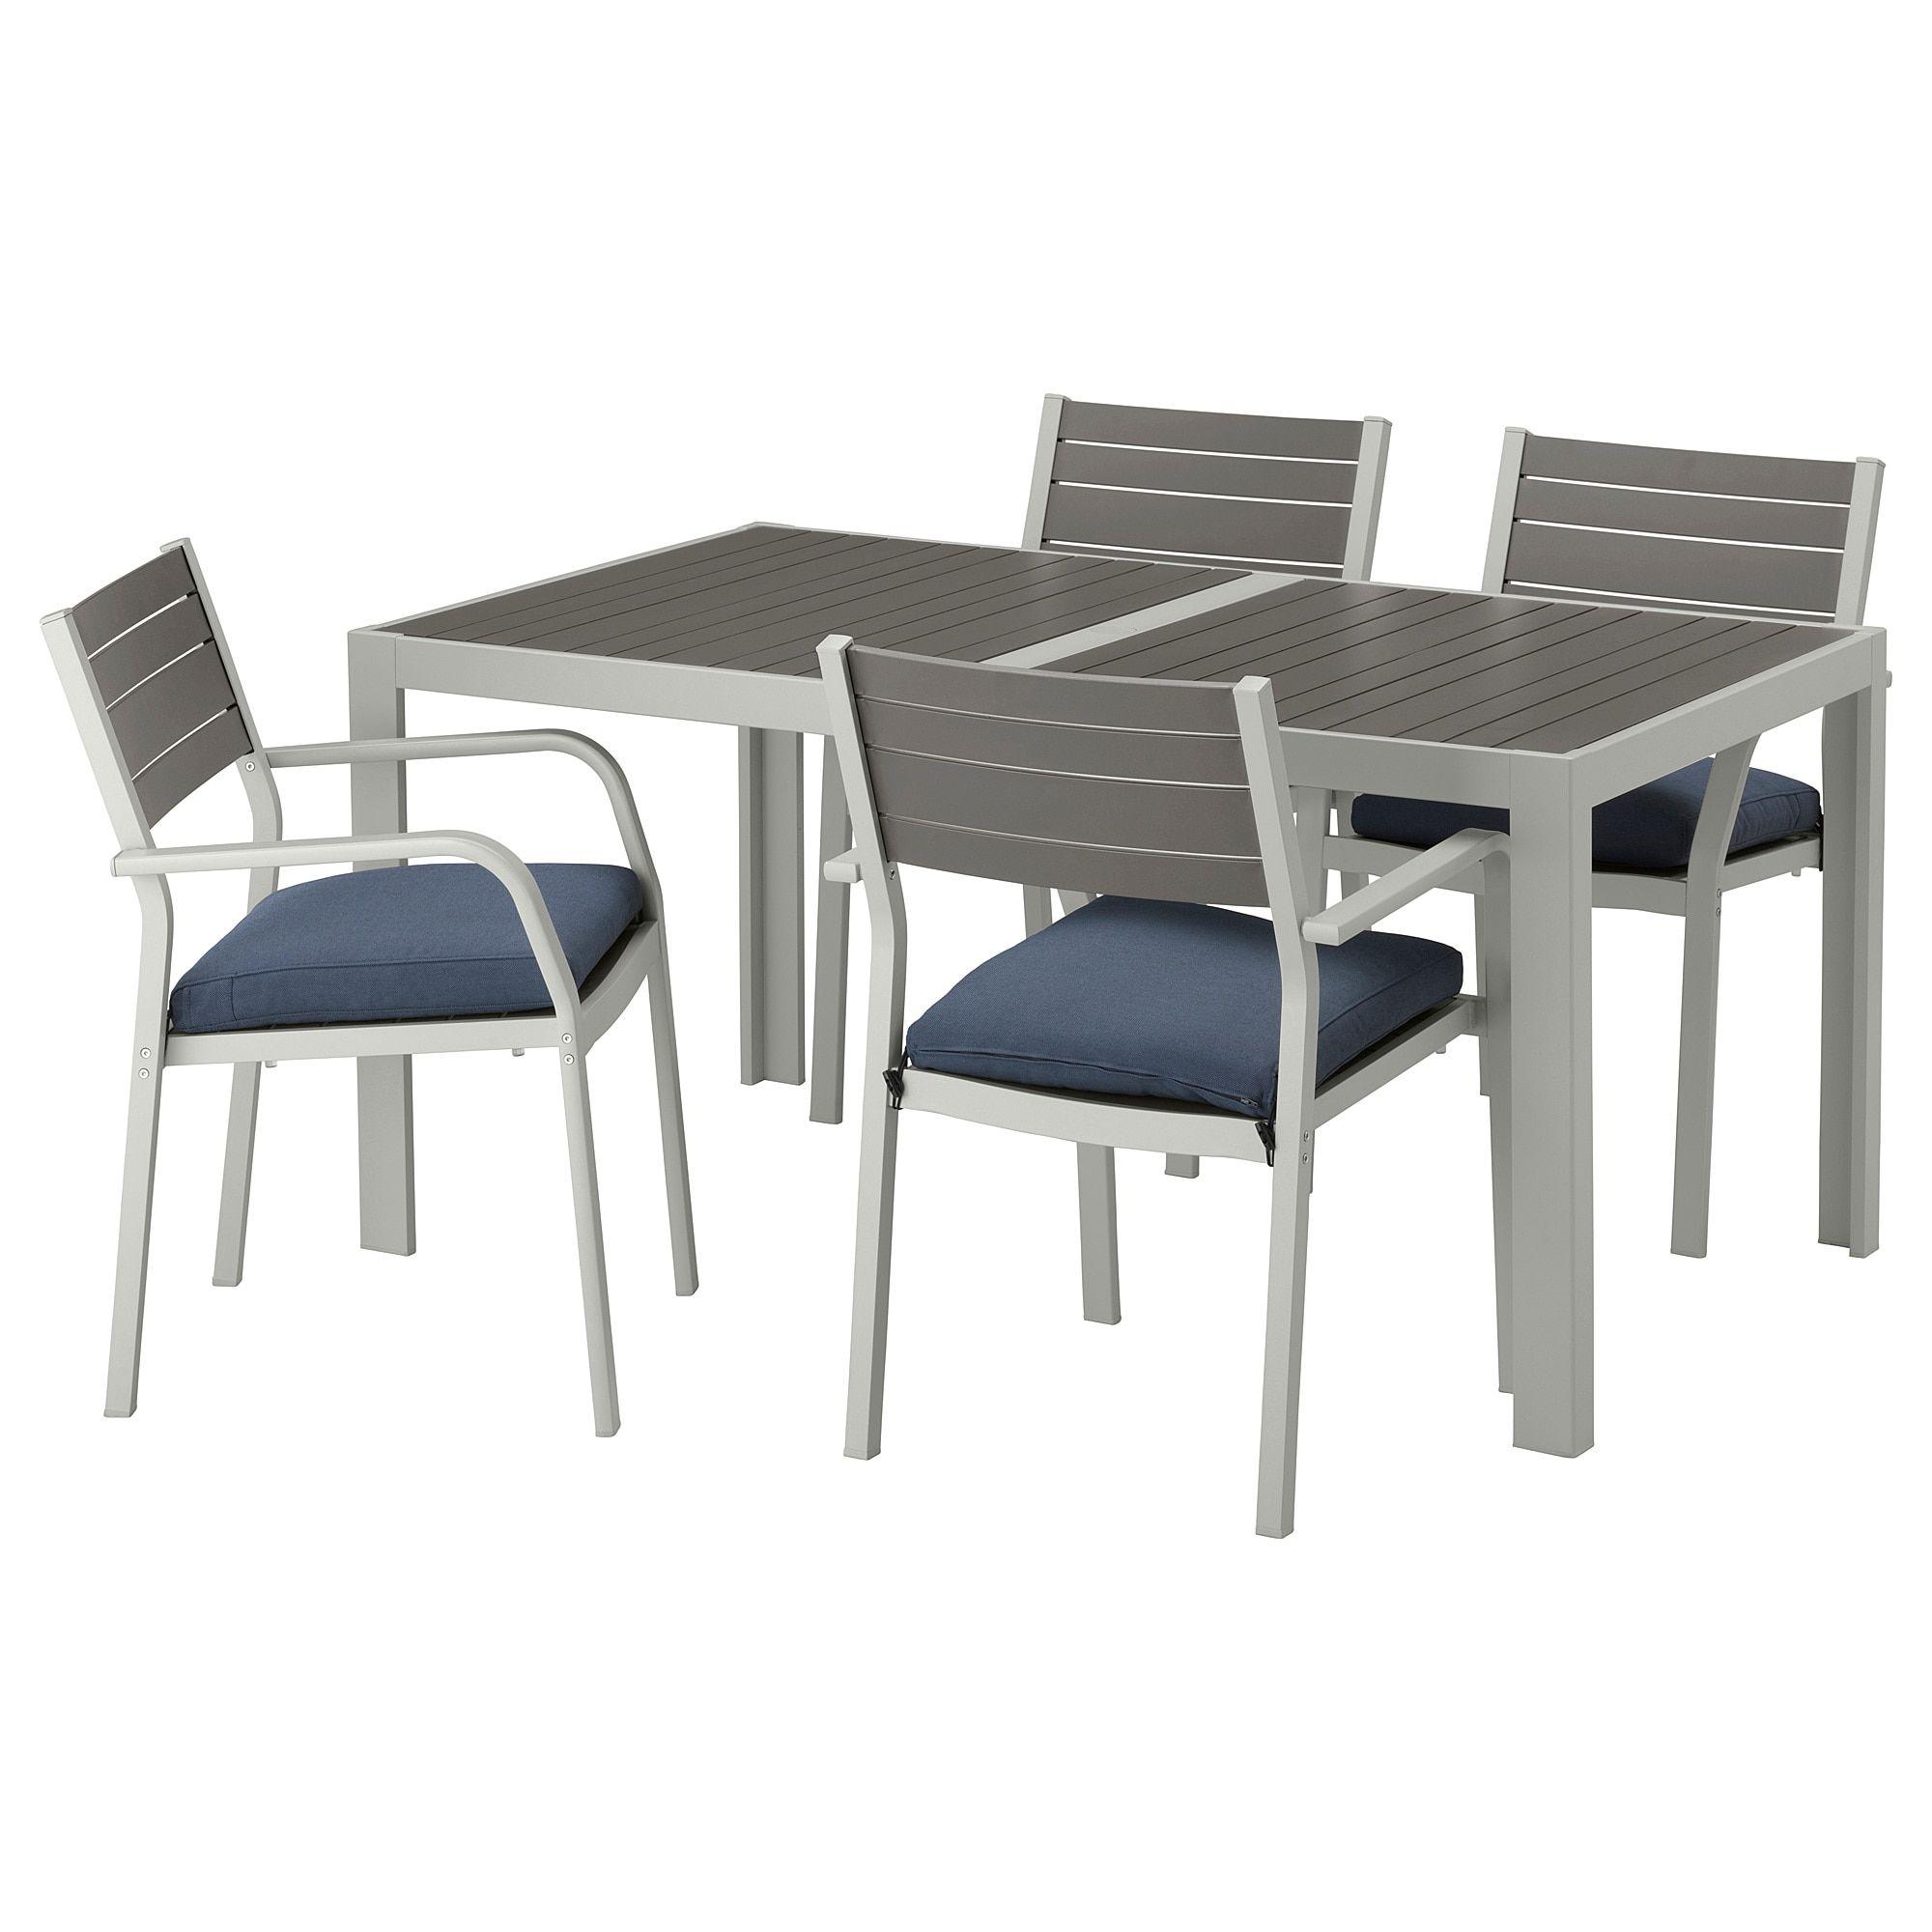 Sjalland Tisch 4 Armlehnstuhle Aussen Dunkelgrau Froson Duvholmen